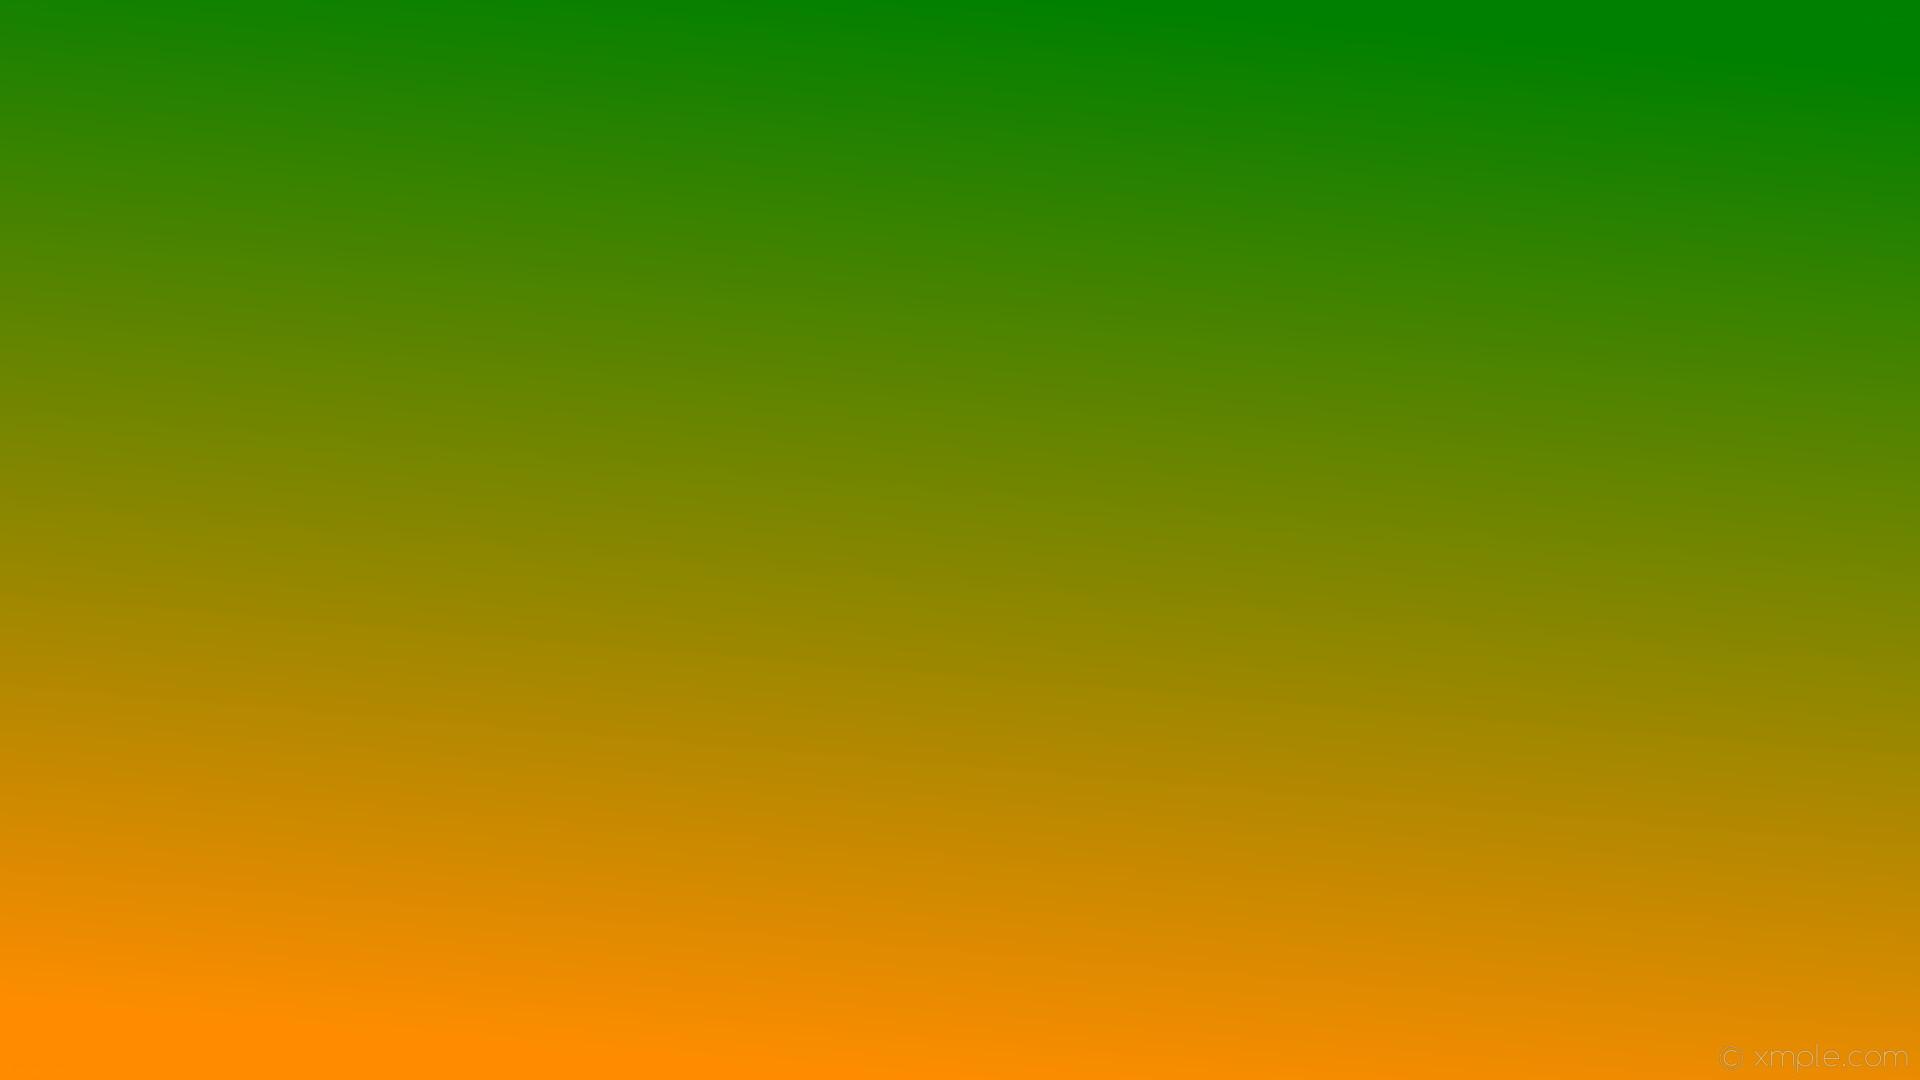 wallpaper gradient orange green linear dark orange #008000 #ff8c00 75°